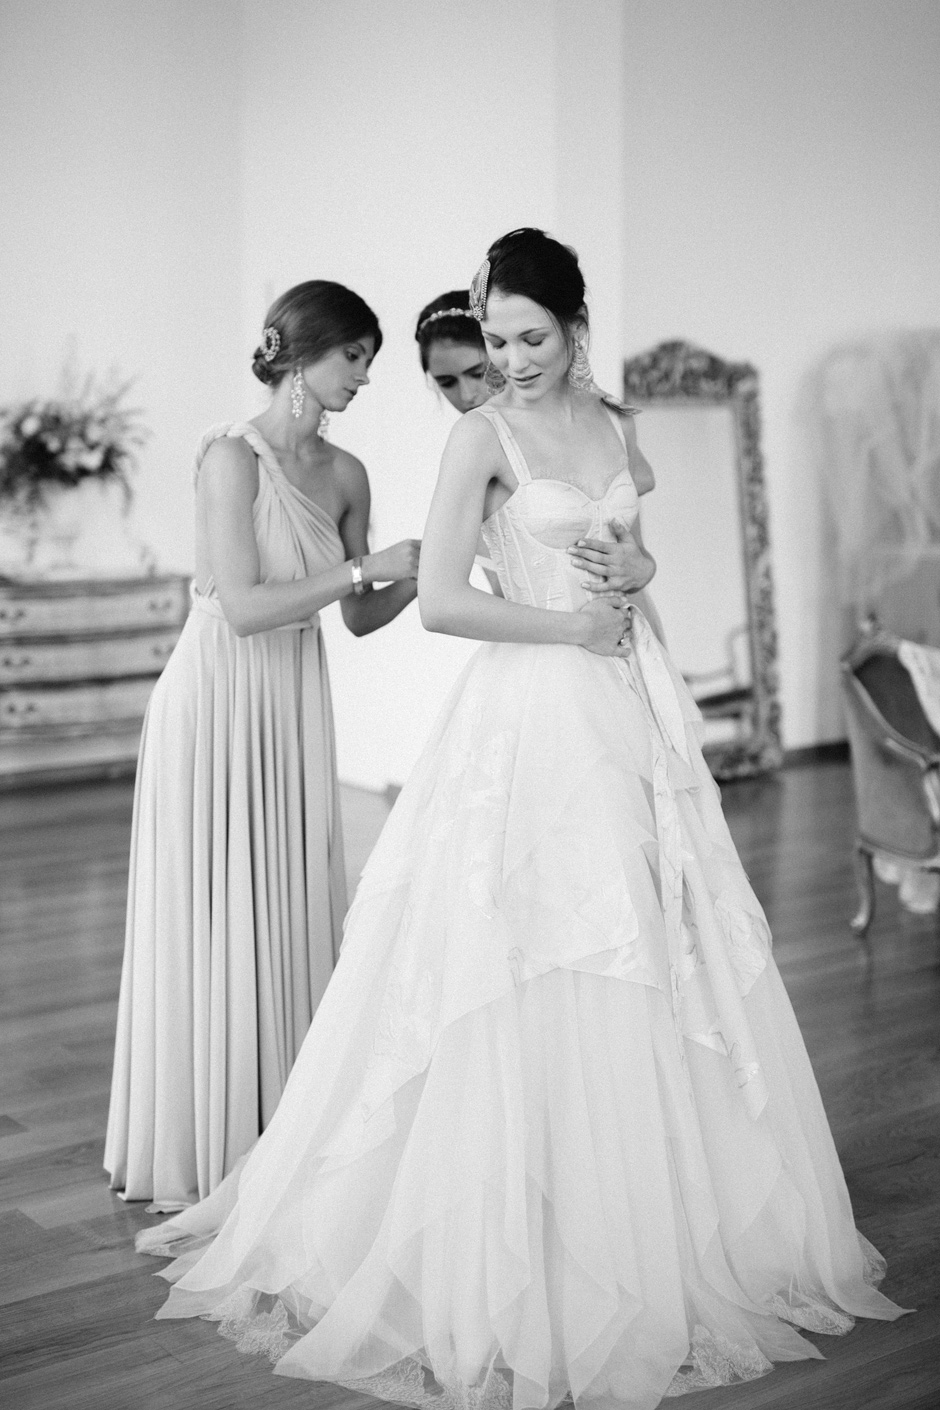 laxenburg-wedding-photographer-012